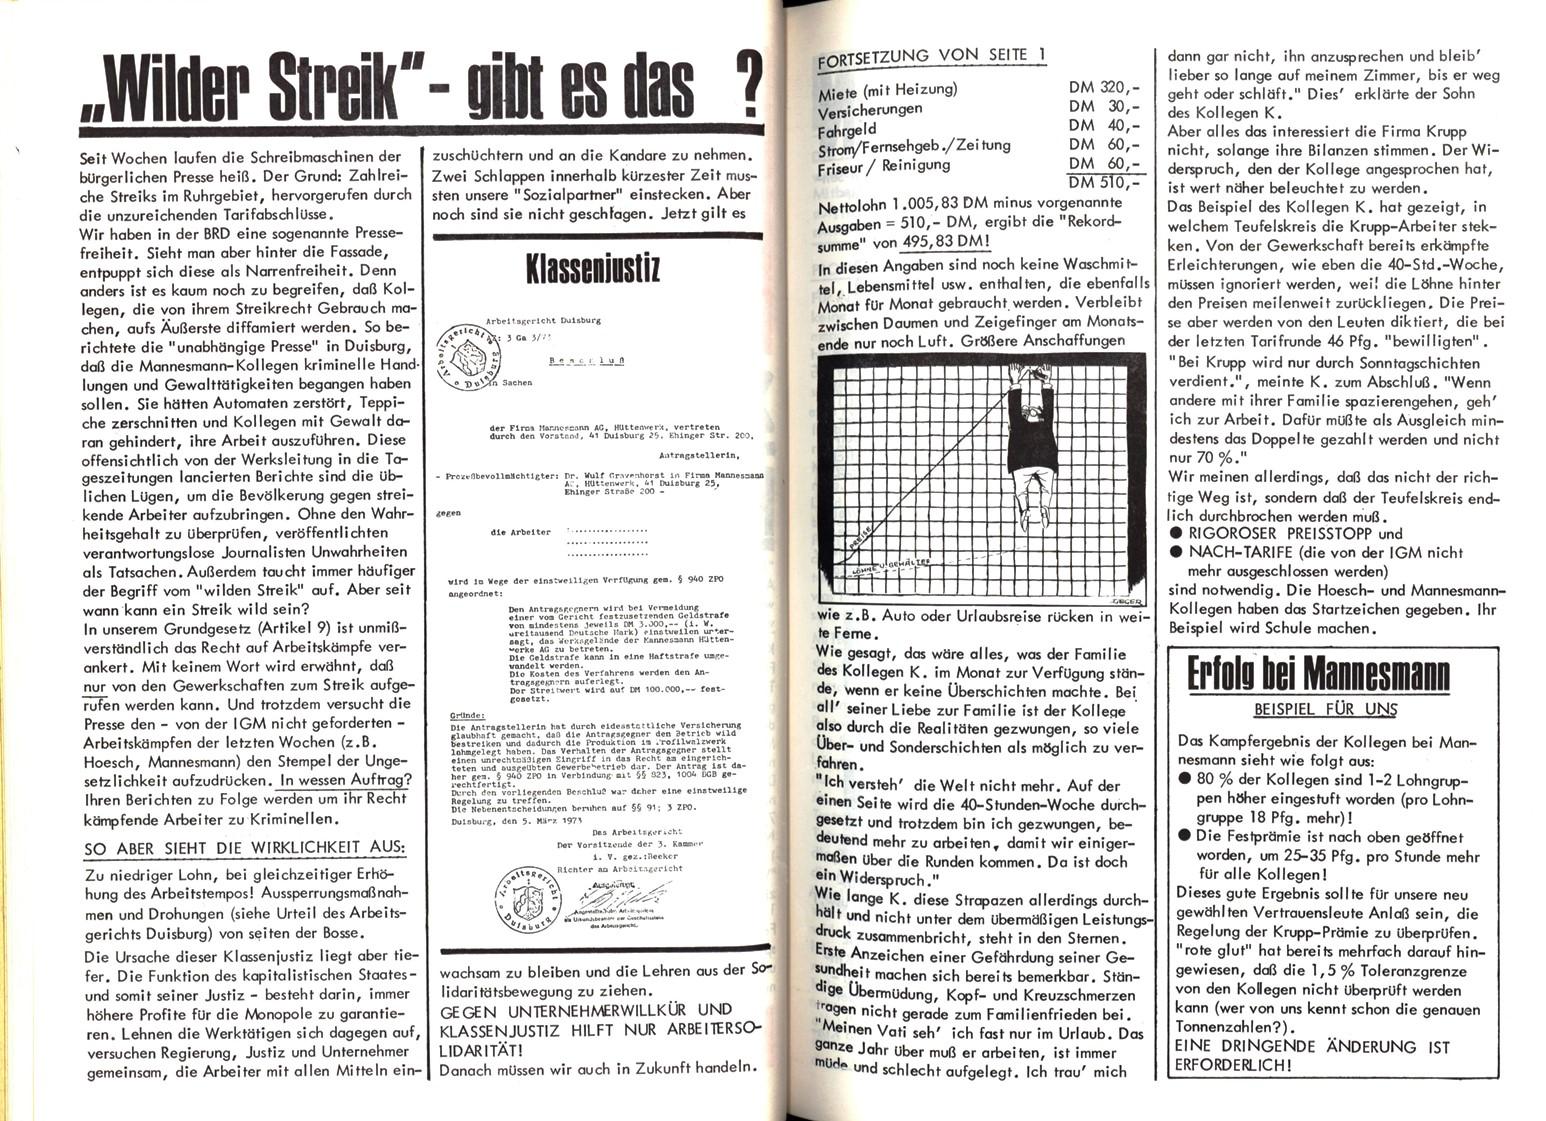 Bochum_DKP_Rote_Glut_19730300_02